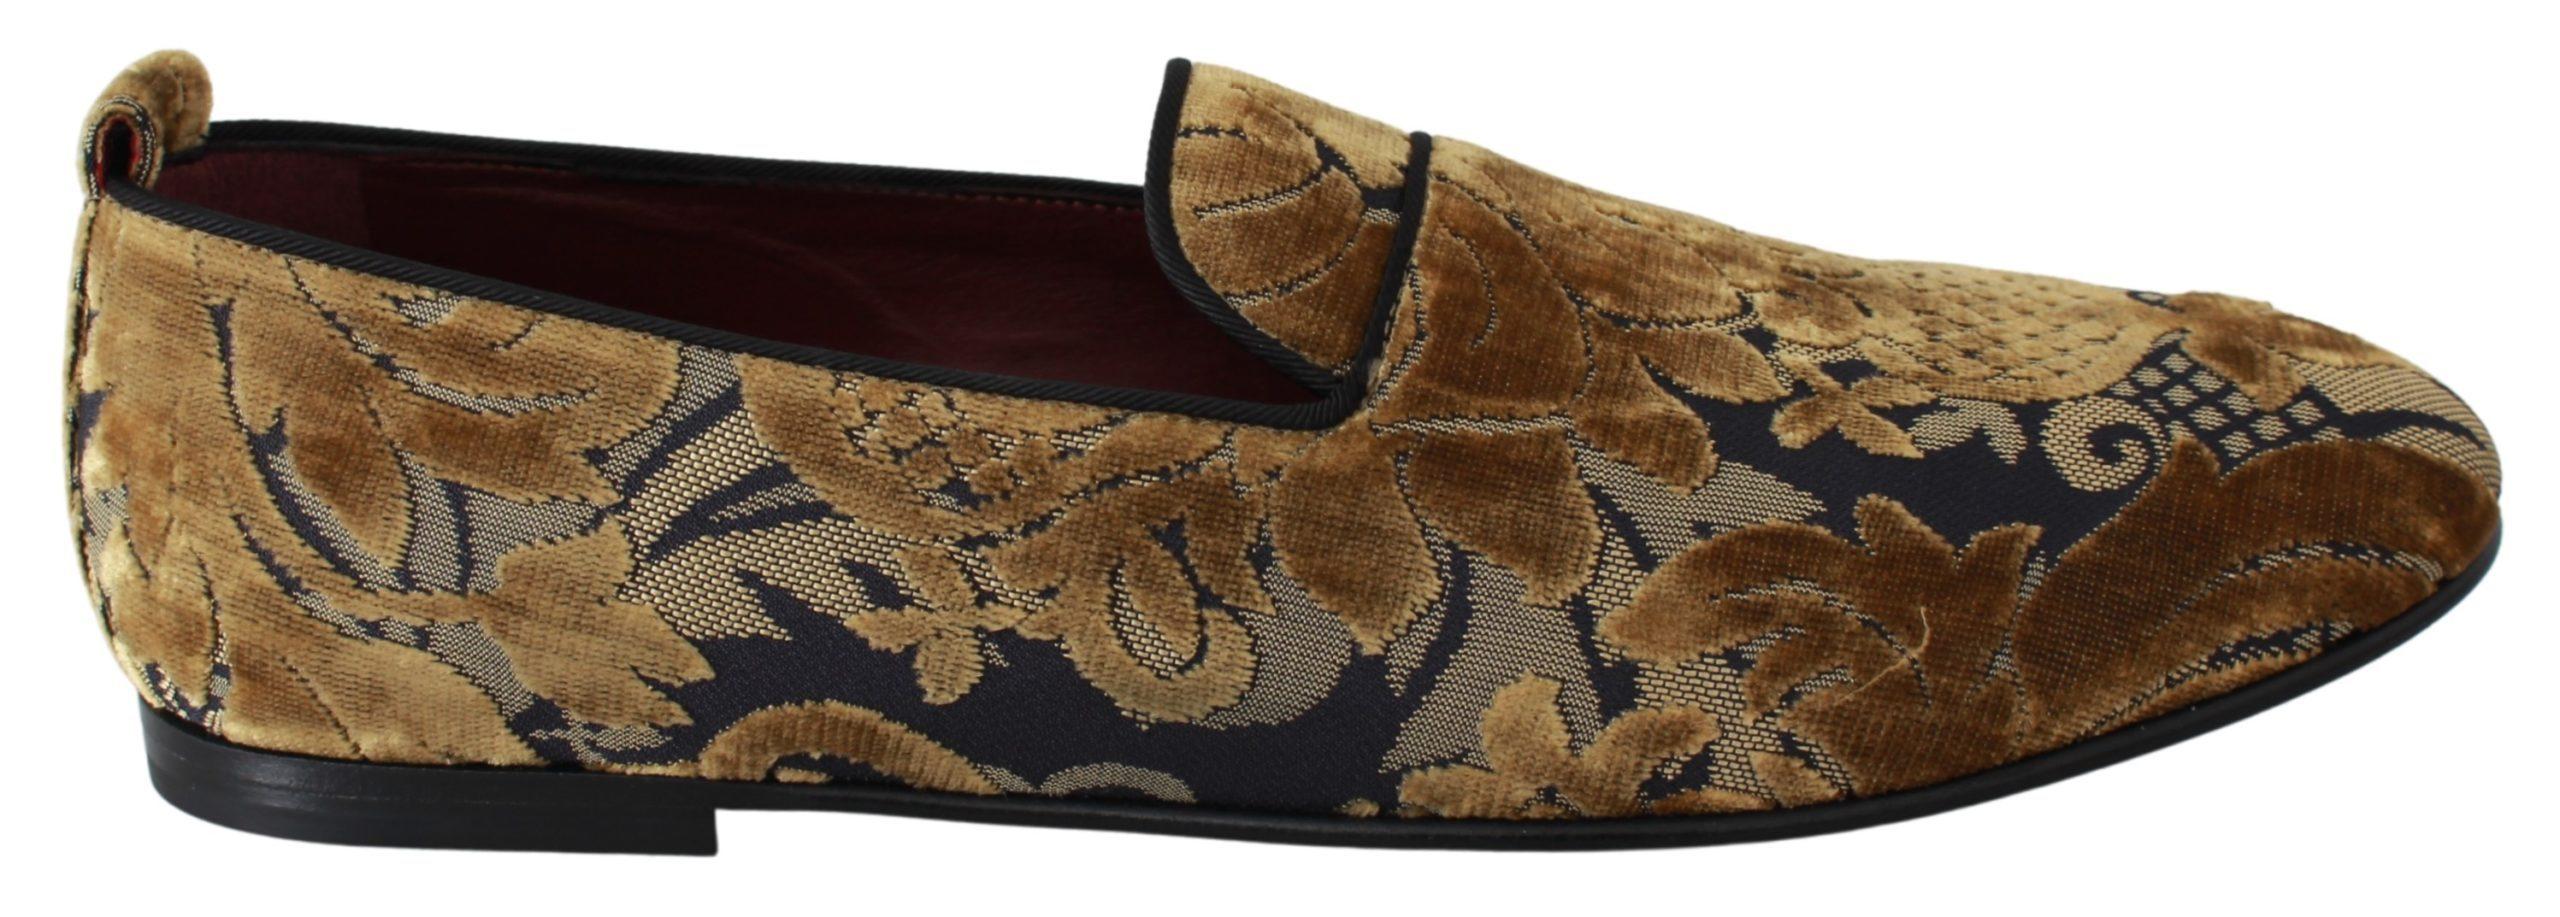 Dolce & Gabbana Men's Brocade Loafers Gold MV2703 - EU40/US7